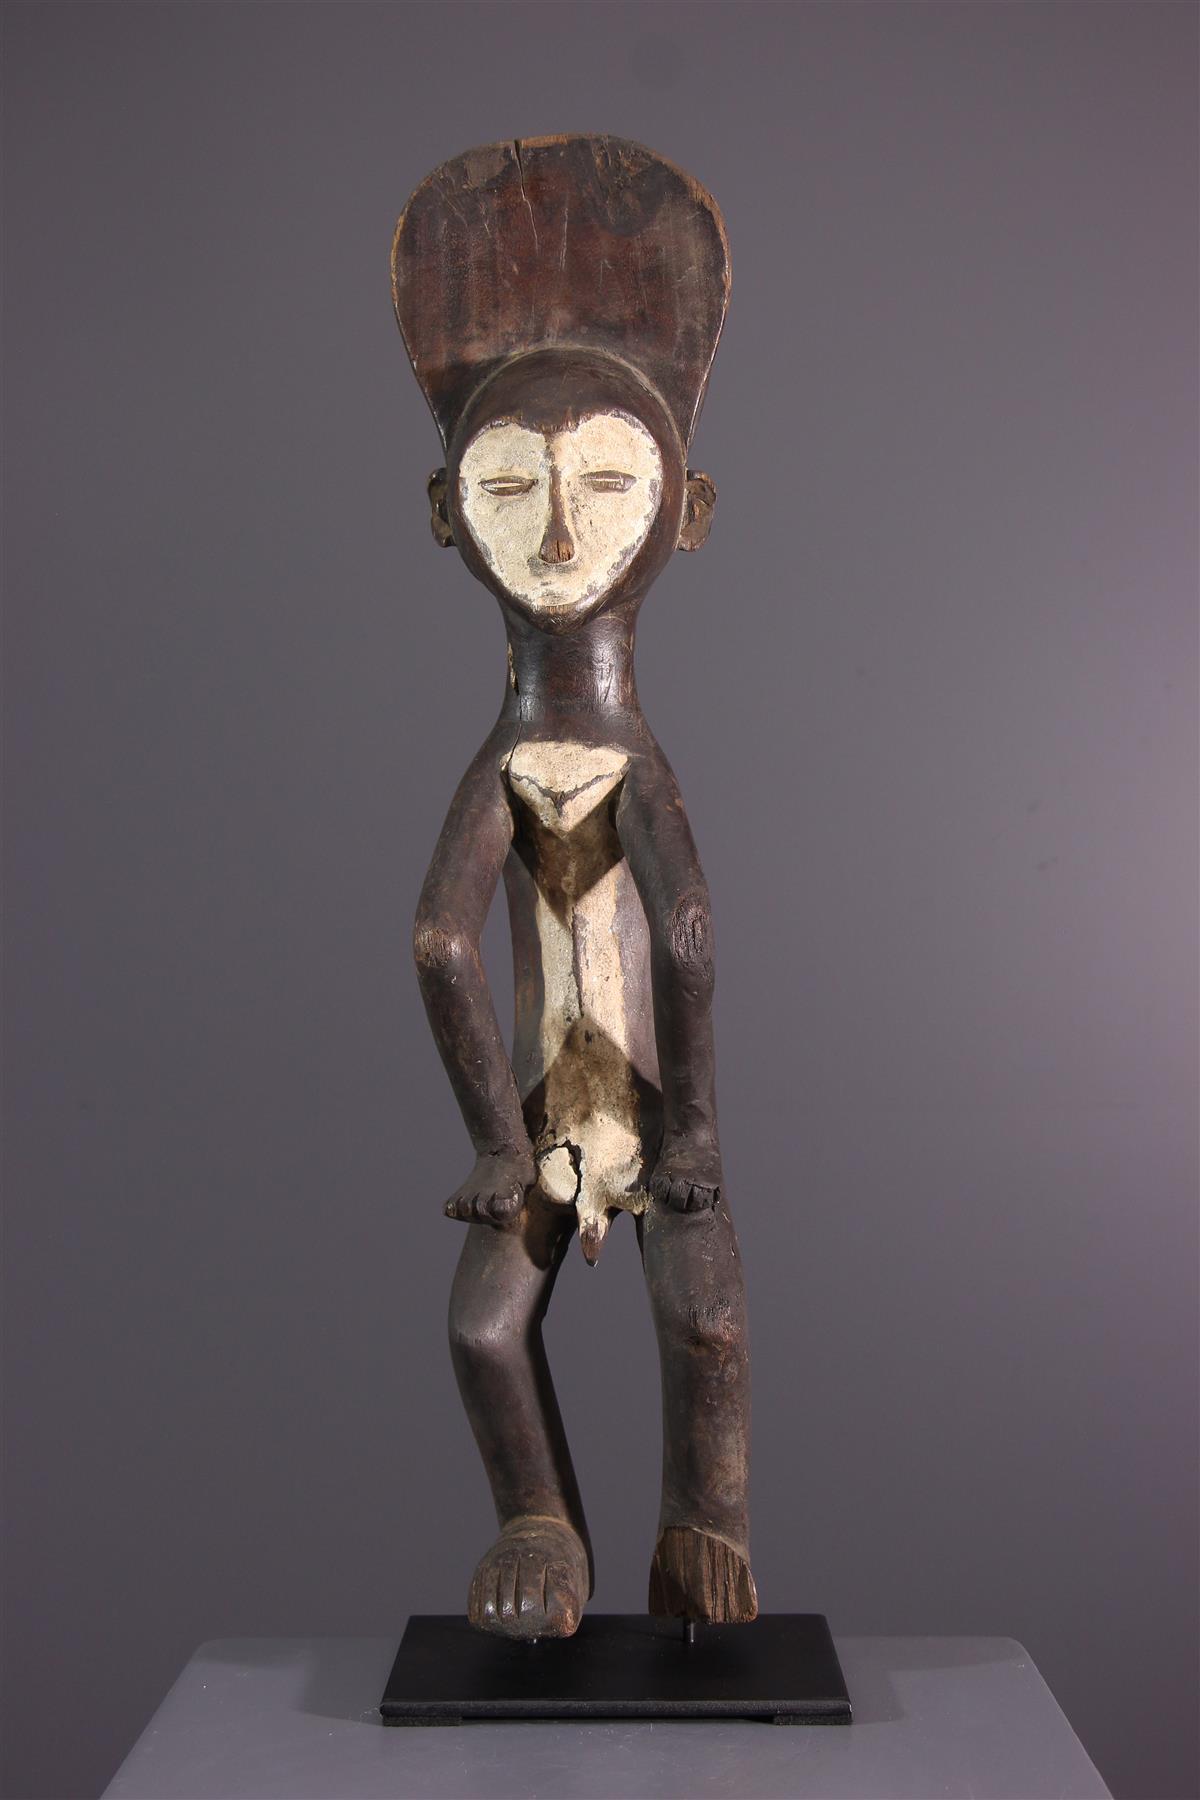 Mbole standbeeld - Afrikaanse kunst